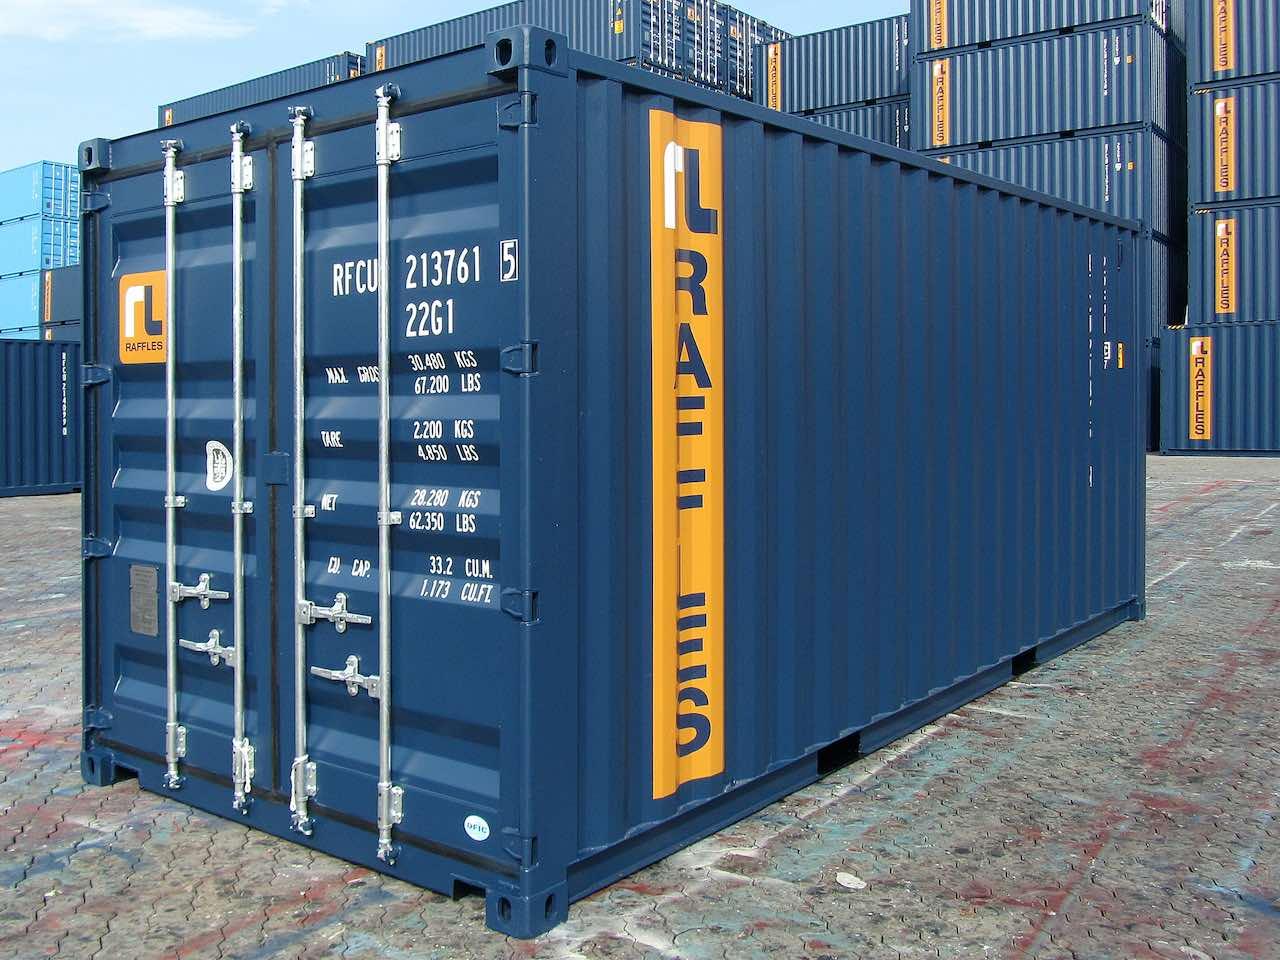 Dunkelblauer Standardcontainer aus dem Repertoire von Buss Capital Invest